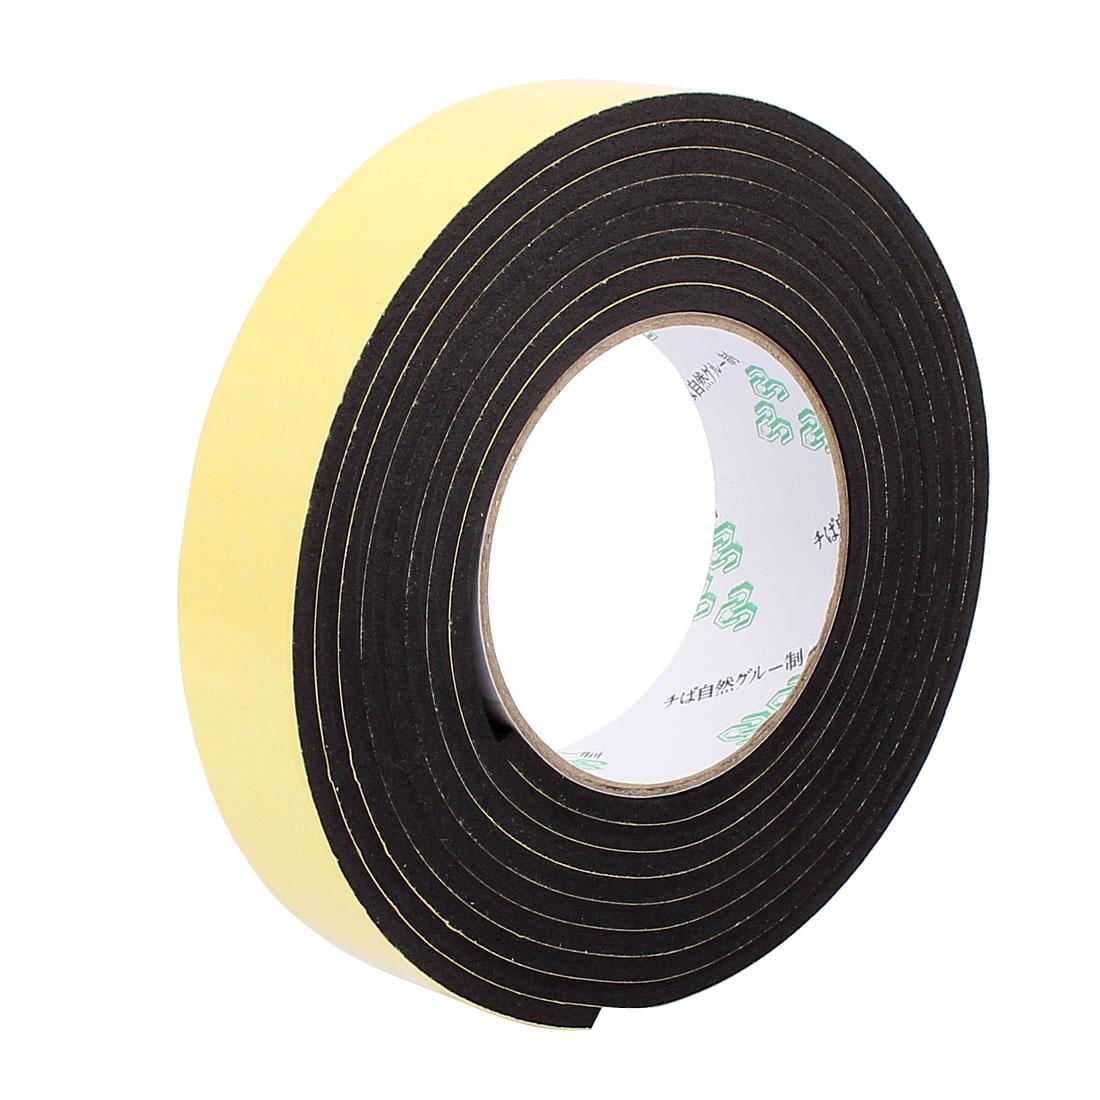 3CM Width 3 Meters Long 4MM Thick Single Sided Sealing Shockproof Sponge Tape